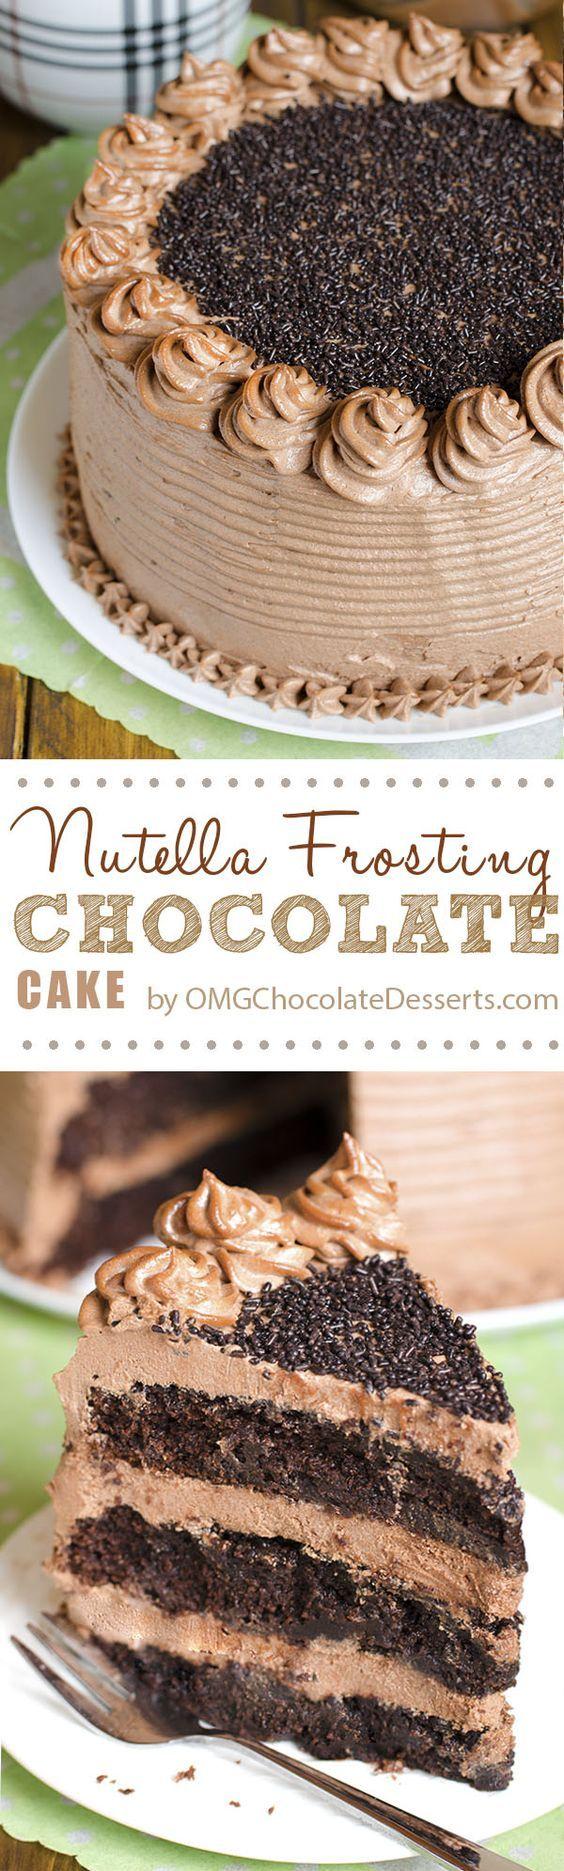 A Sweet Pleasure- Chocolate cake – Netizen Life